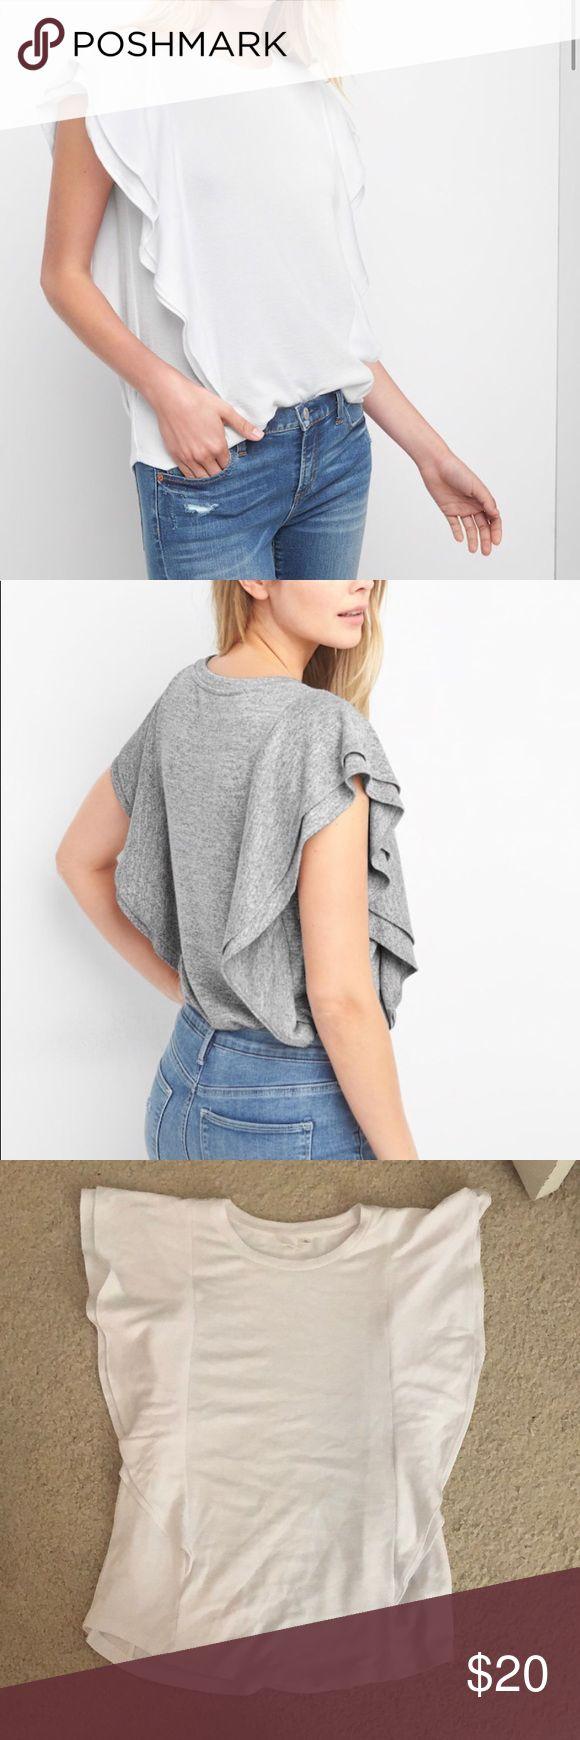 Softspun flutter sleeve top Supersoft marled jersey knit. Double-layered flutter sleeves. Crewneck. Flutter trim seams at sides, curved hem. ** never worn! GAP Tops Tees - Short Sleeve